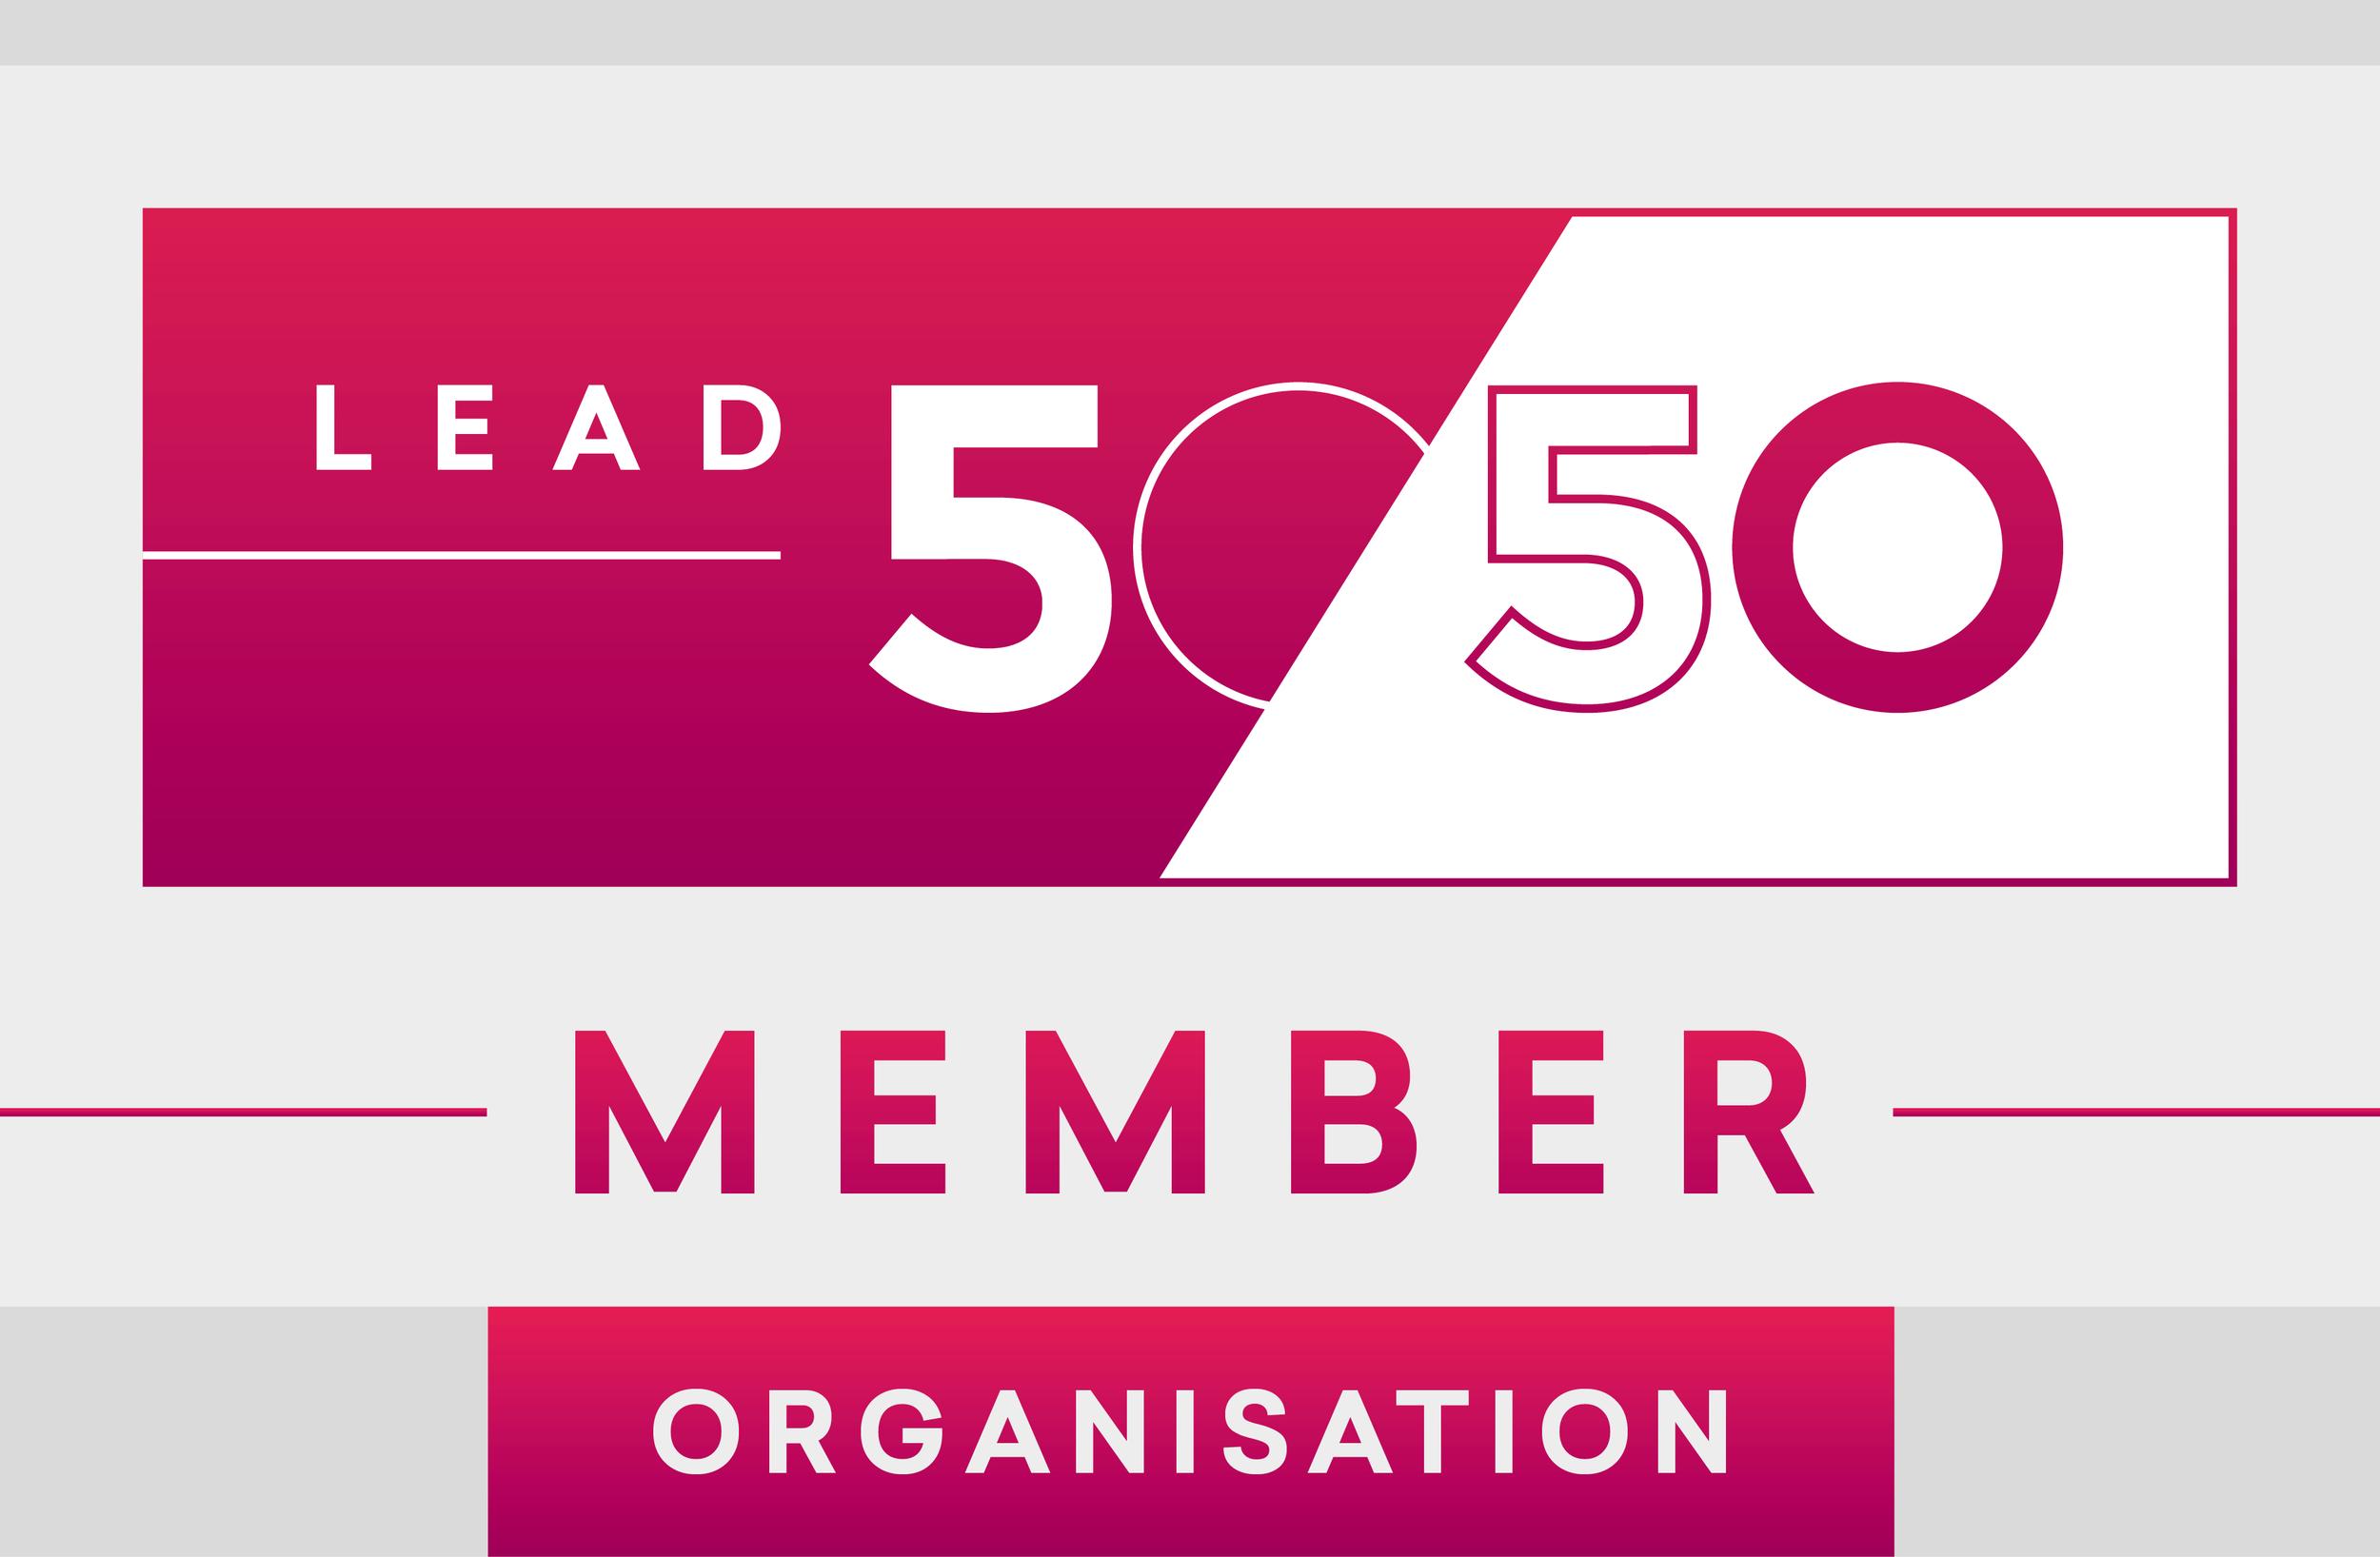 Lead5050-Logo-Organisation-Lrg.png